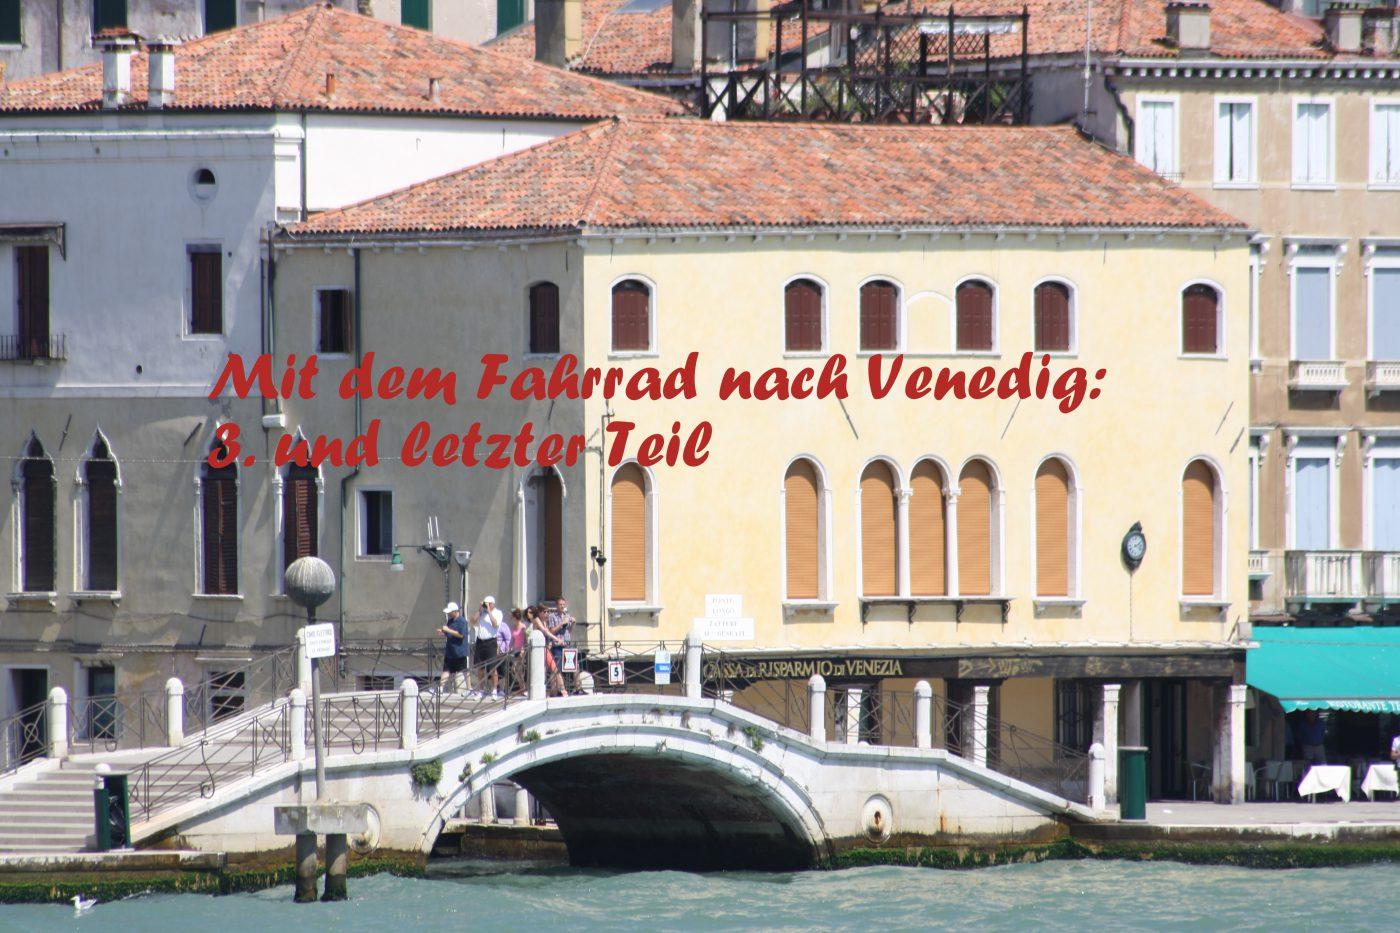 Nach Venedig mit dem Rad: 3. Teil 1